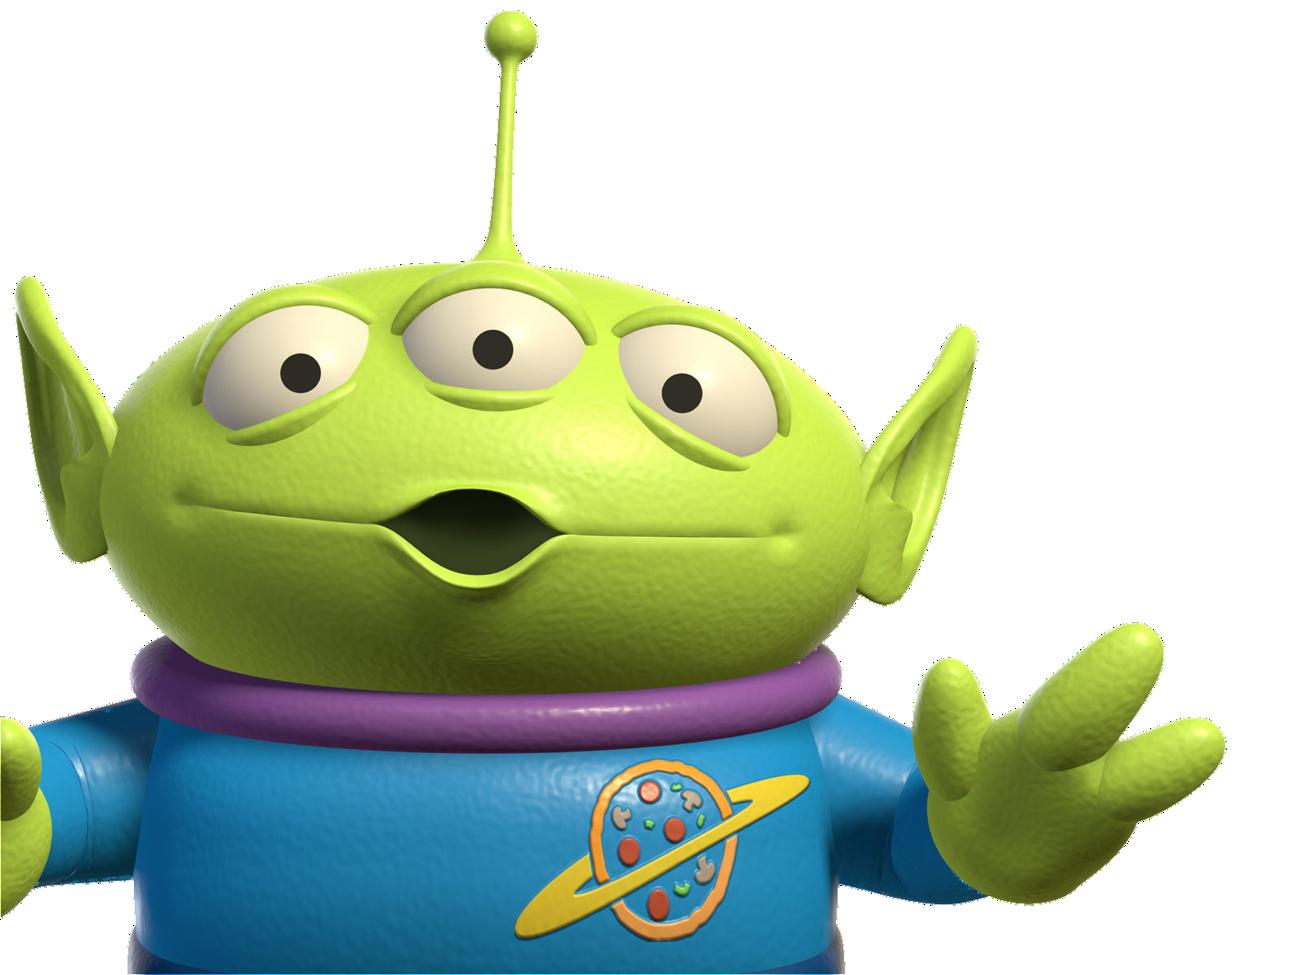 Imagens Toy Story Png Fundo Transparente Alien Do Toy Story Toy Story 3 Toy Story